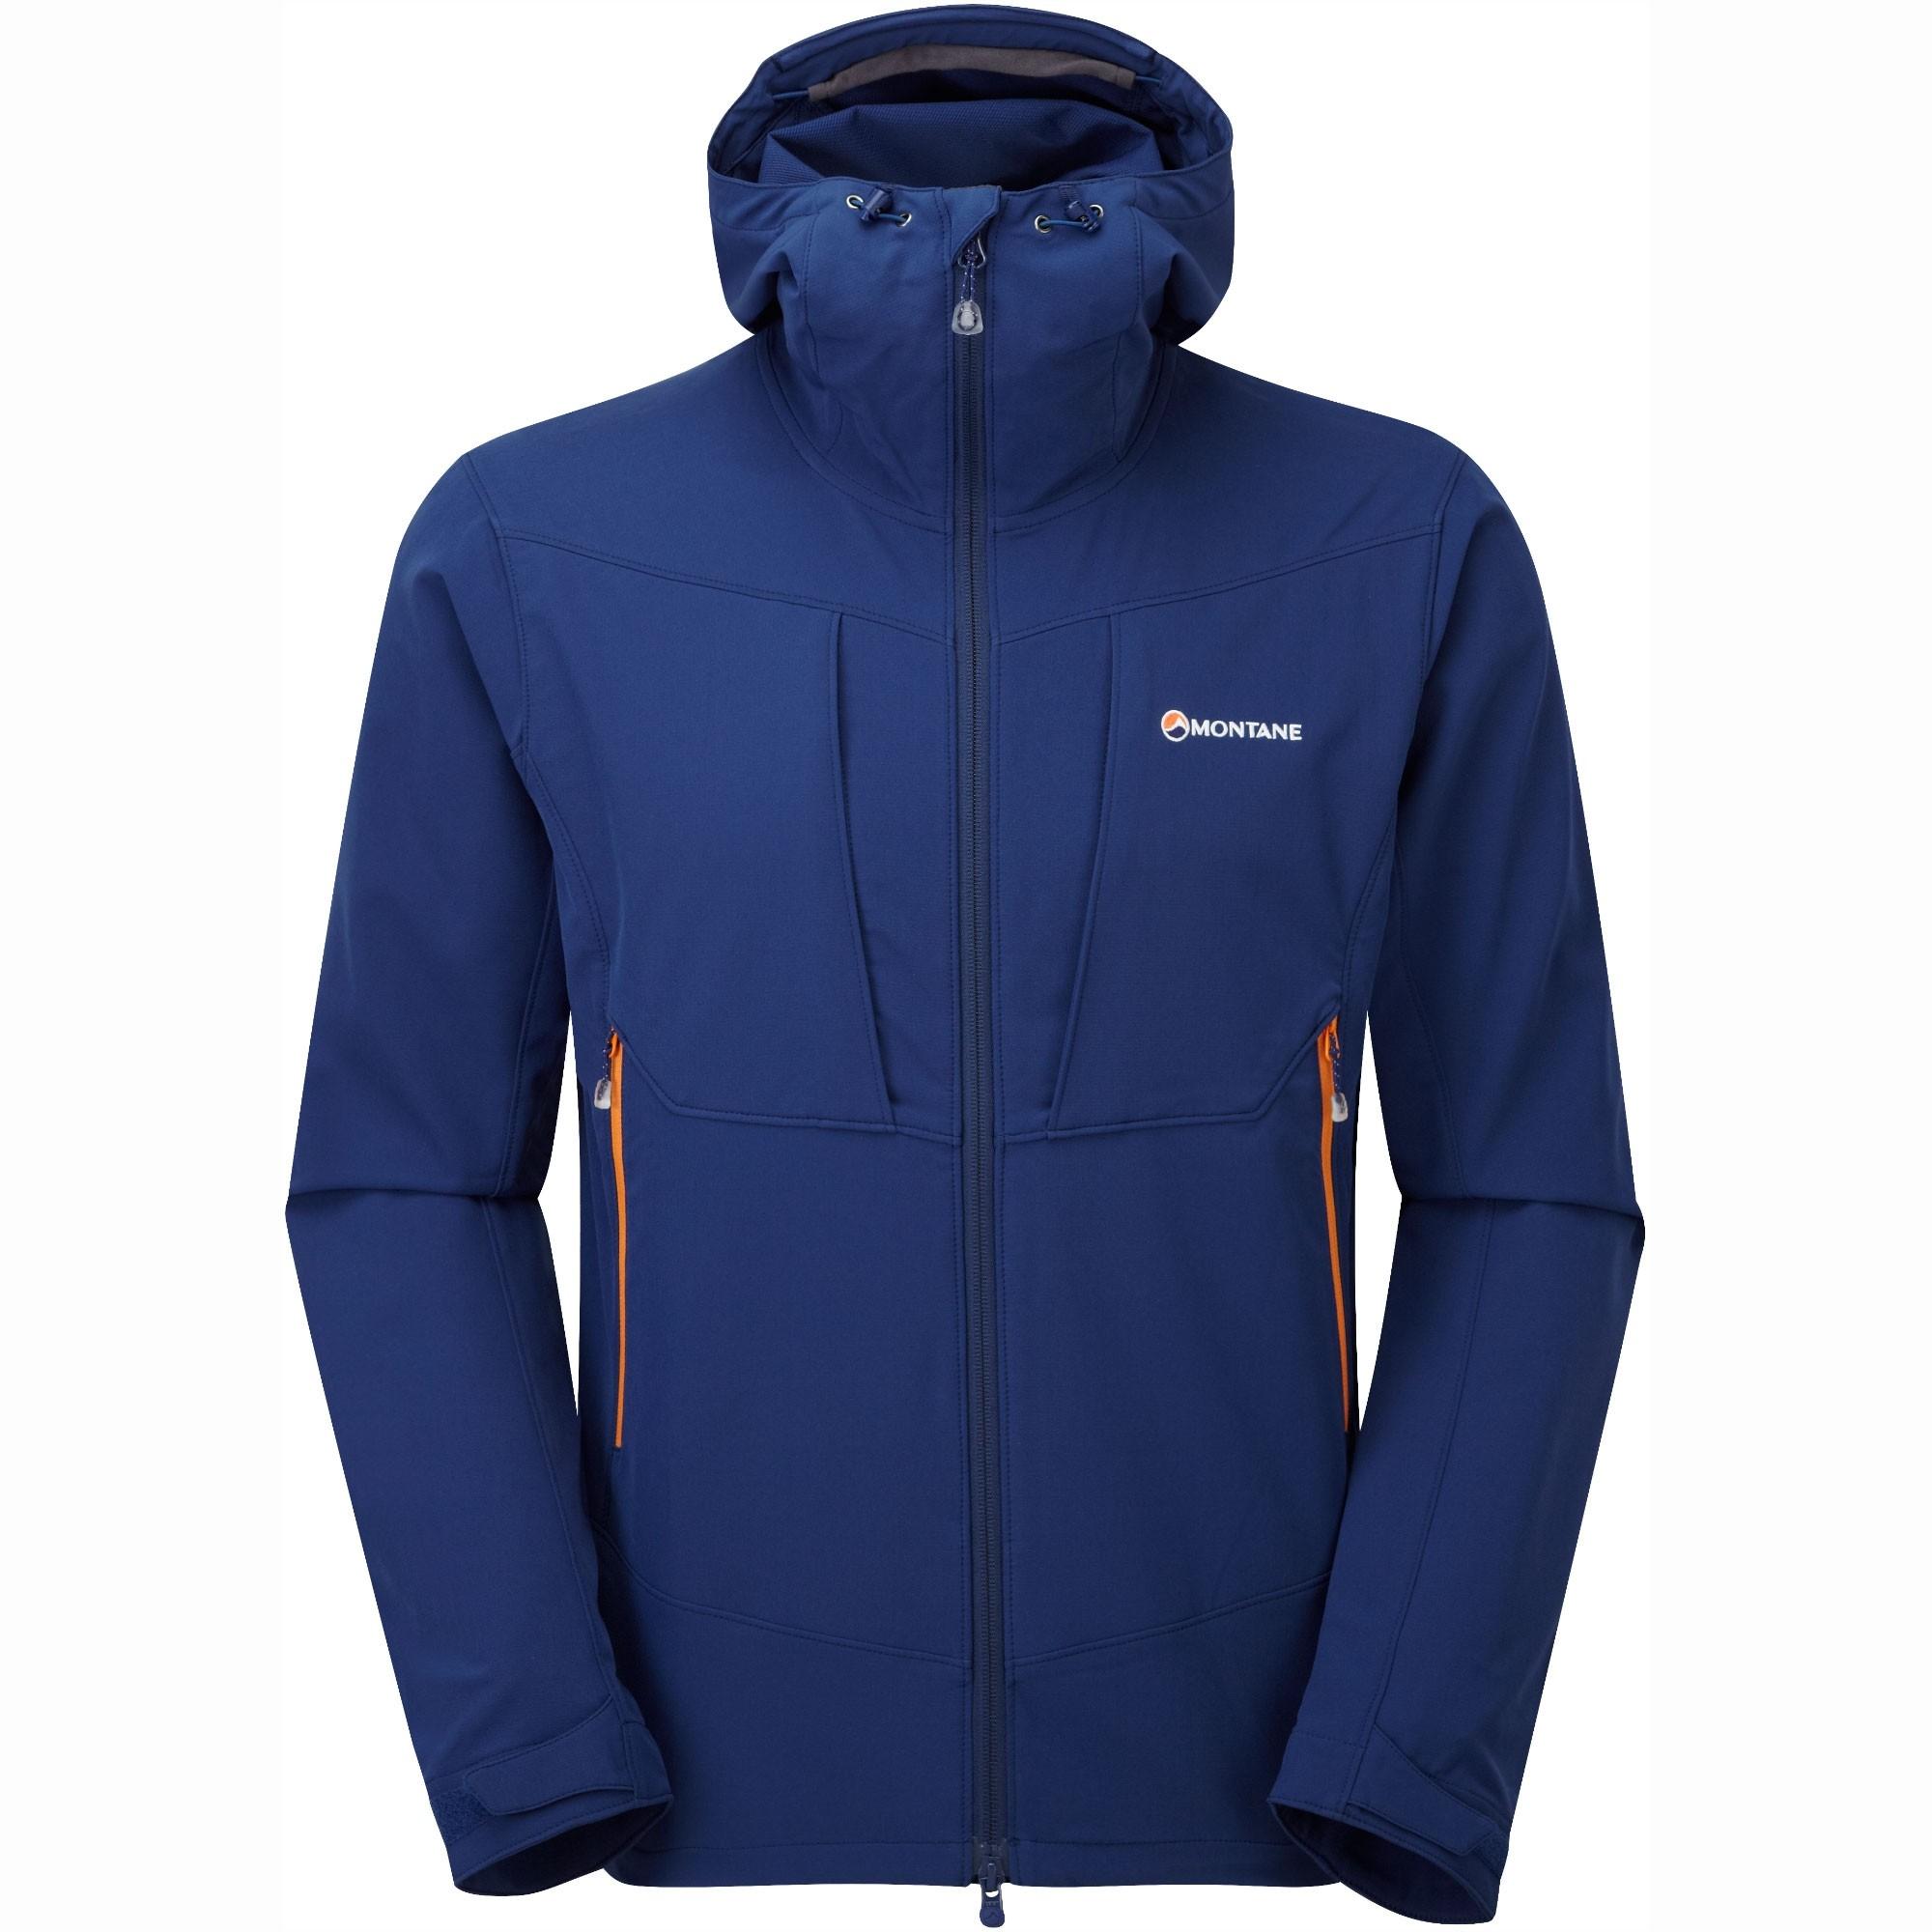 Montane Dyno Stretch Jacket - Antarctic Blue